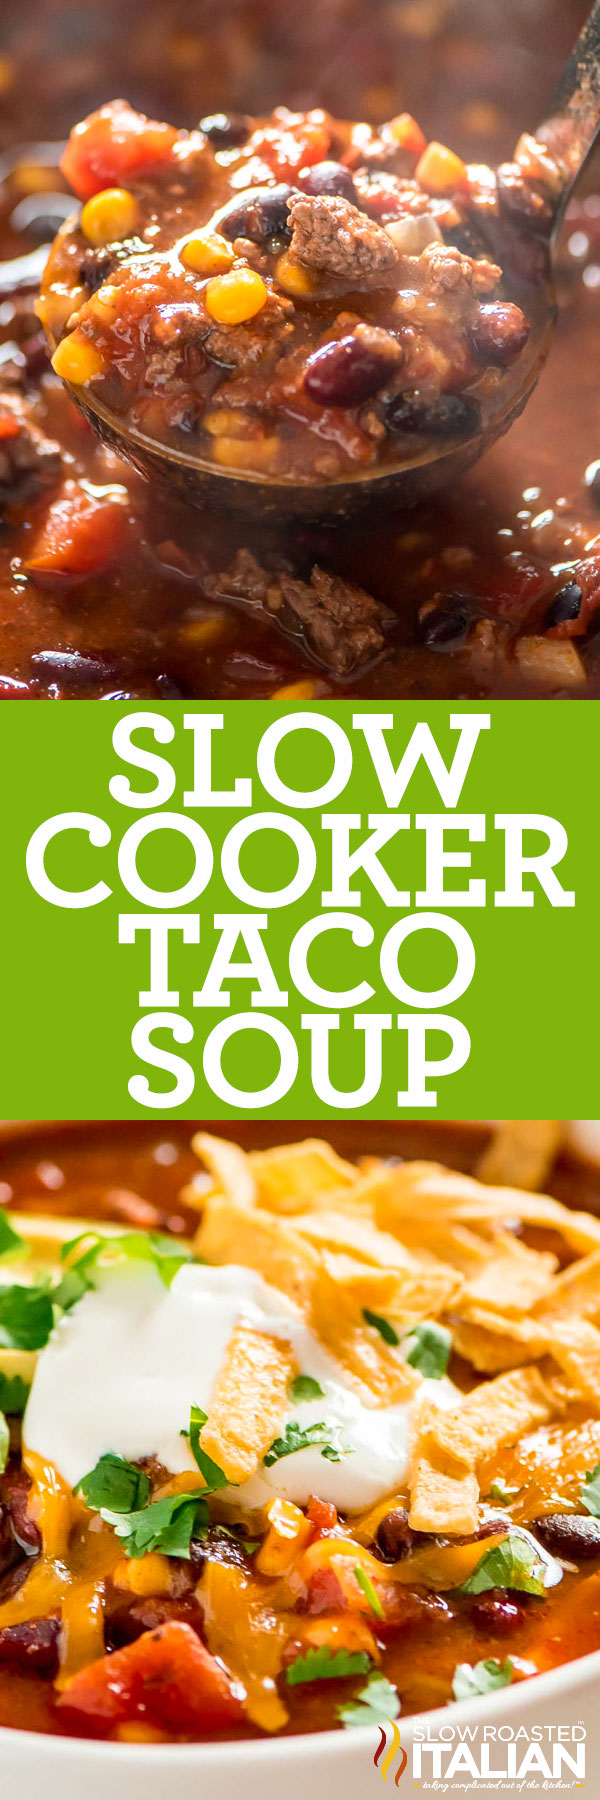 Slow Cooker Taco Soup Recipe closeup